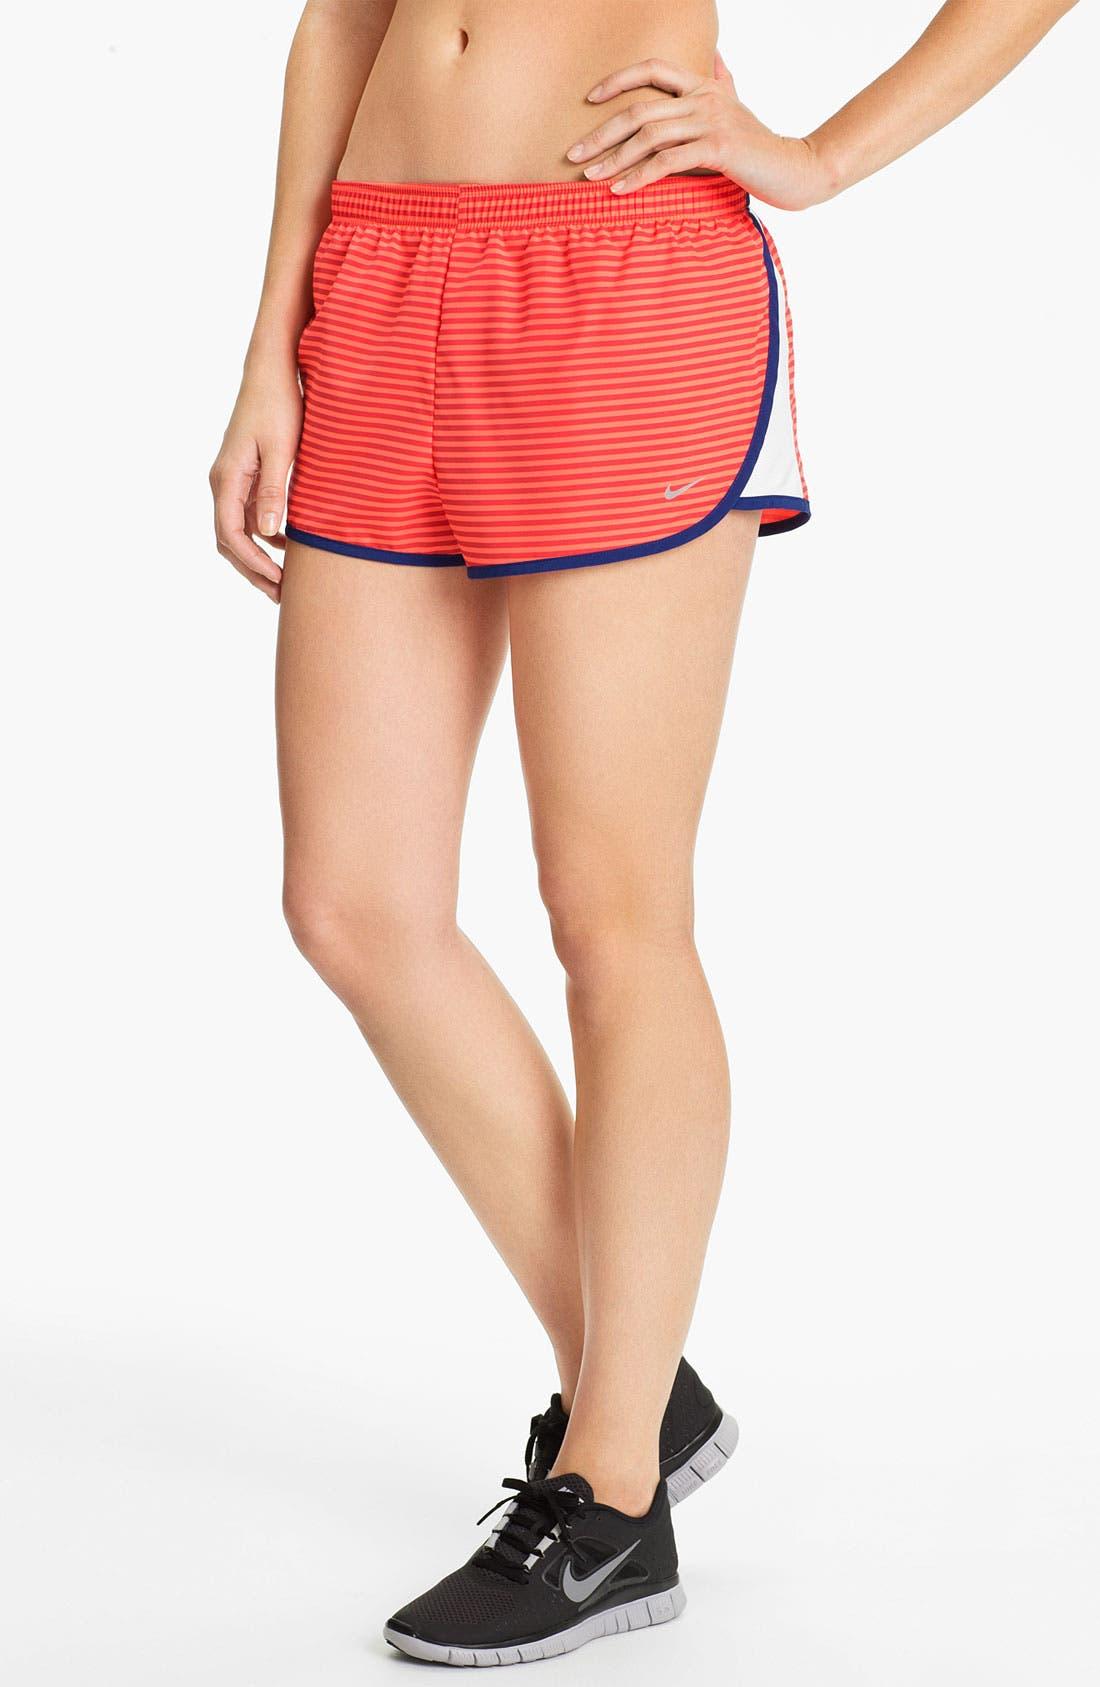 Alternate Image 1 Selected - Nike 'Road Race' Stripe Running Shorts